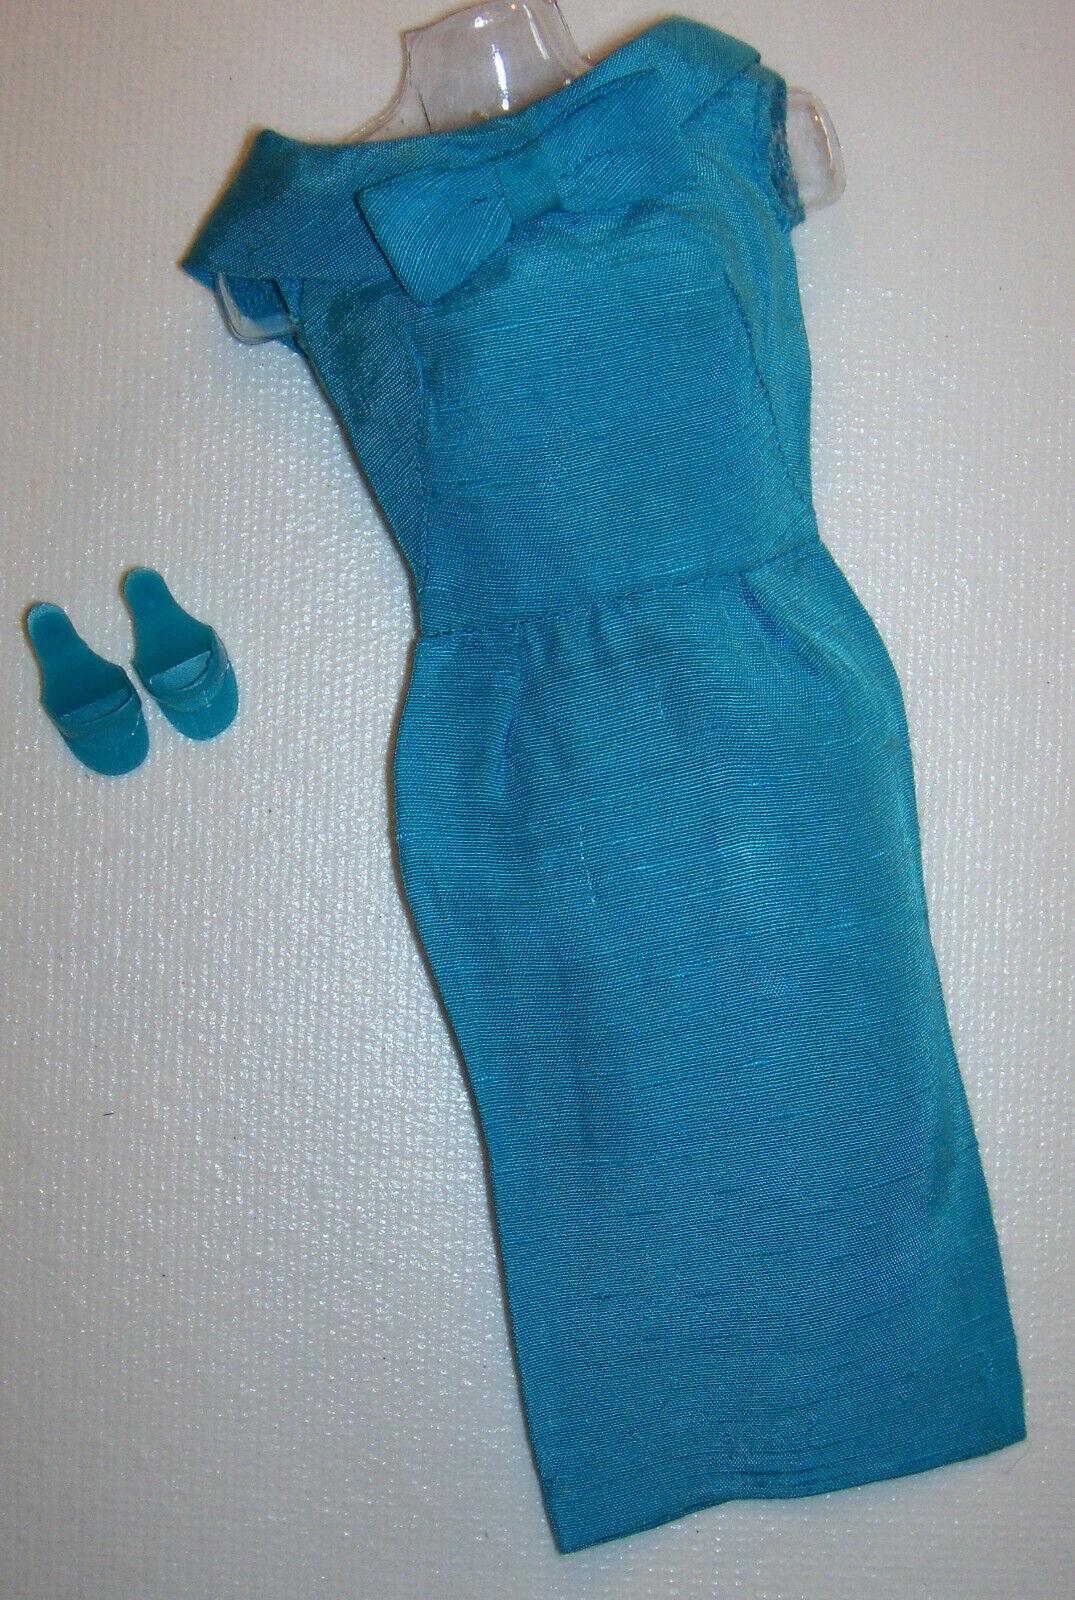 Vintage Barbie Turchese Gioiello Tono Silk Vestito Guaina Moda Pak 1962 Ot